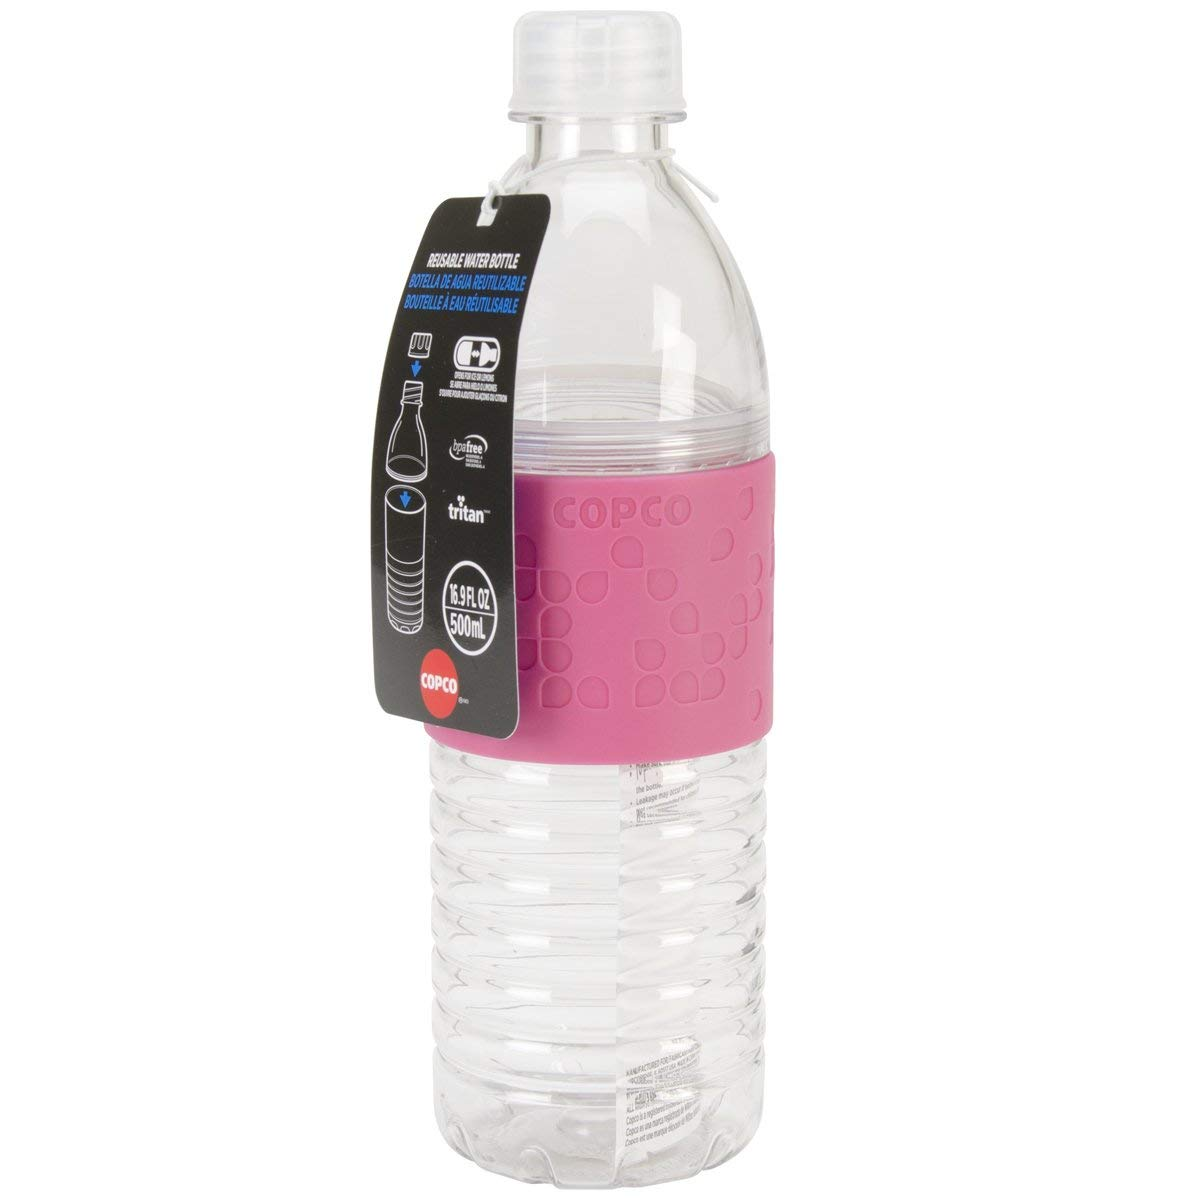 Copco Hydra Water Bottle Non Slip Sleeve BPA Free 16.9 Oz 3 Pack Robins Egg Blue